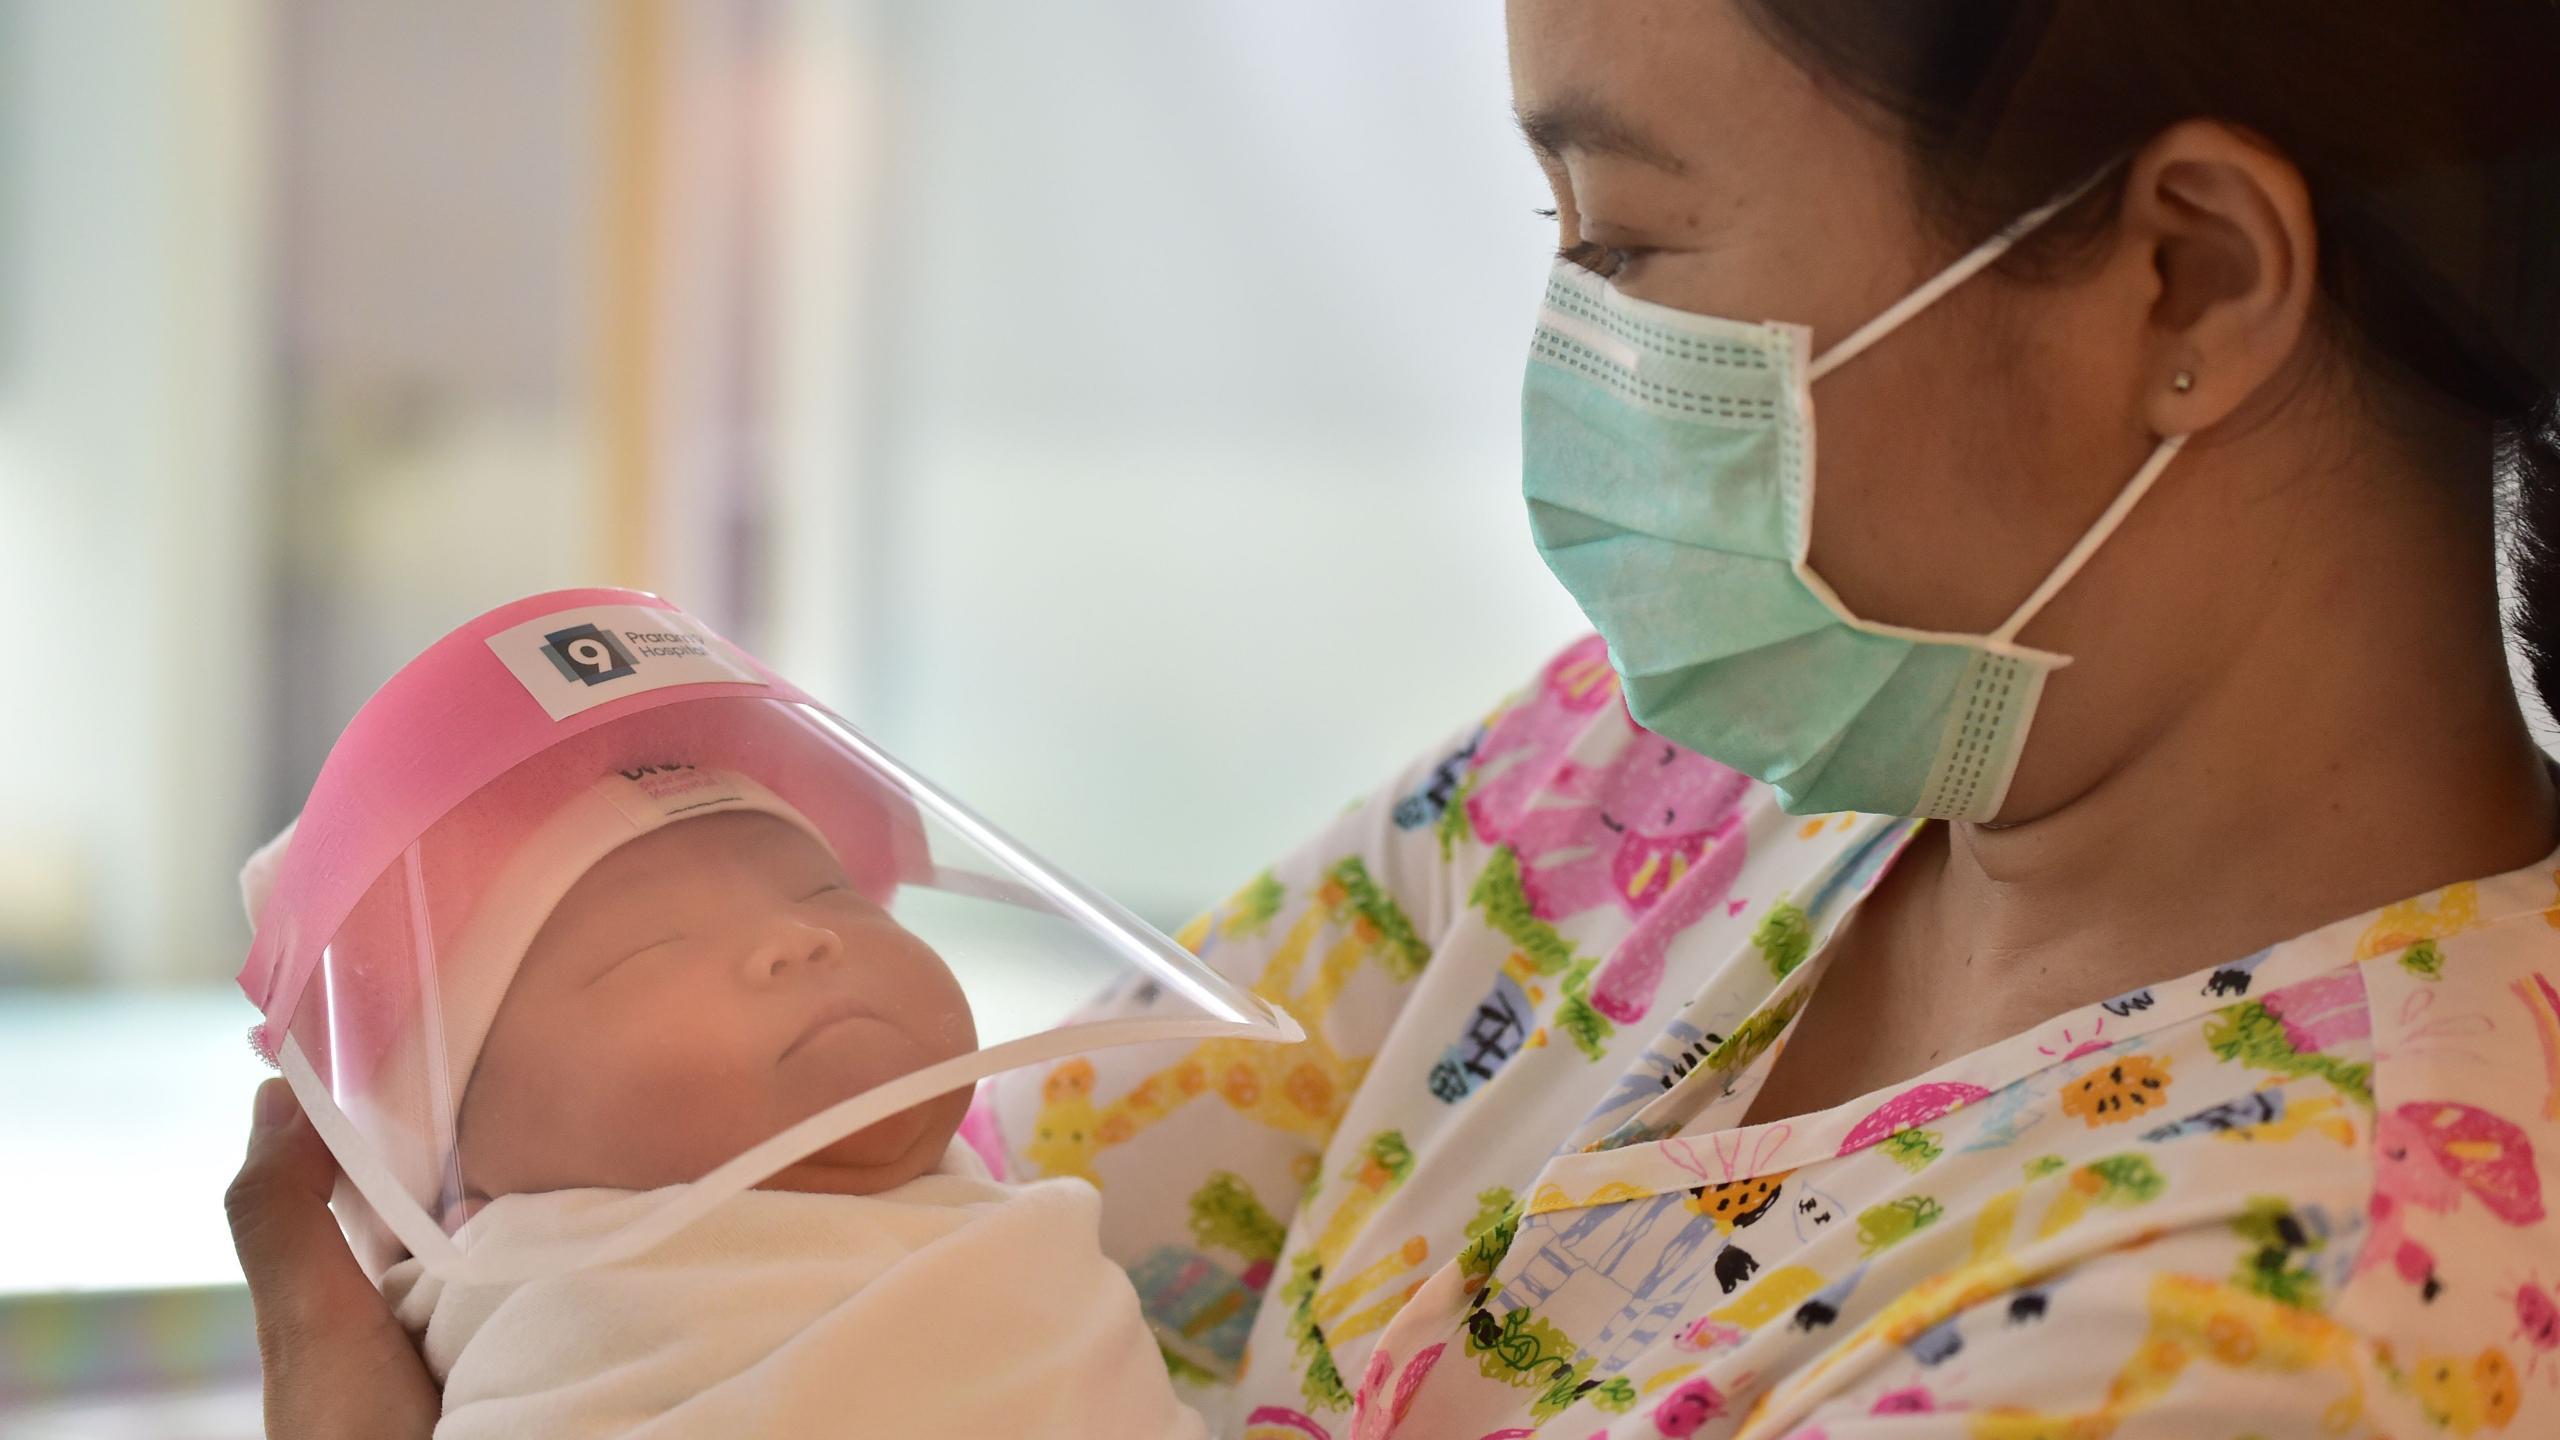 Стоит ли изолировать младенцев от матерей с Covid-19